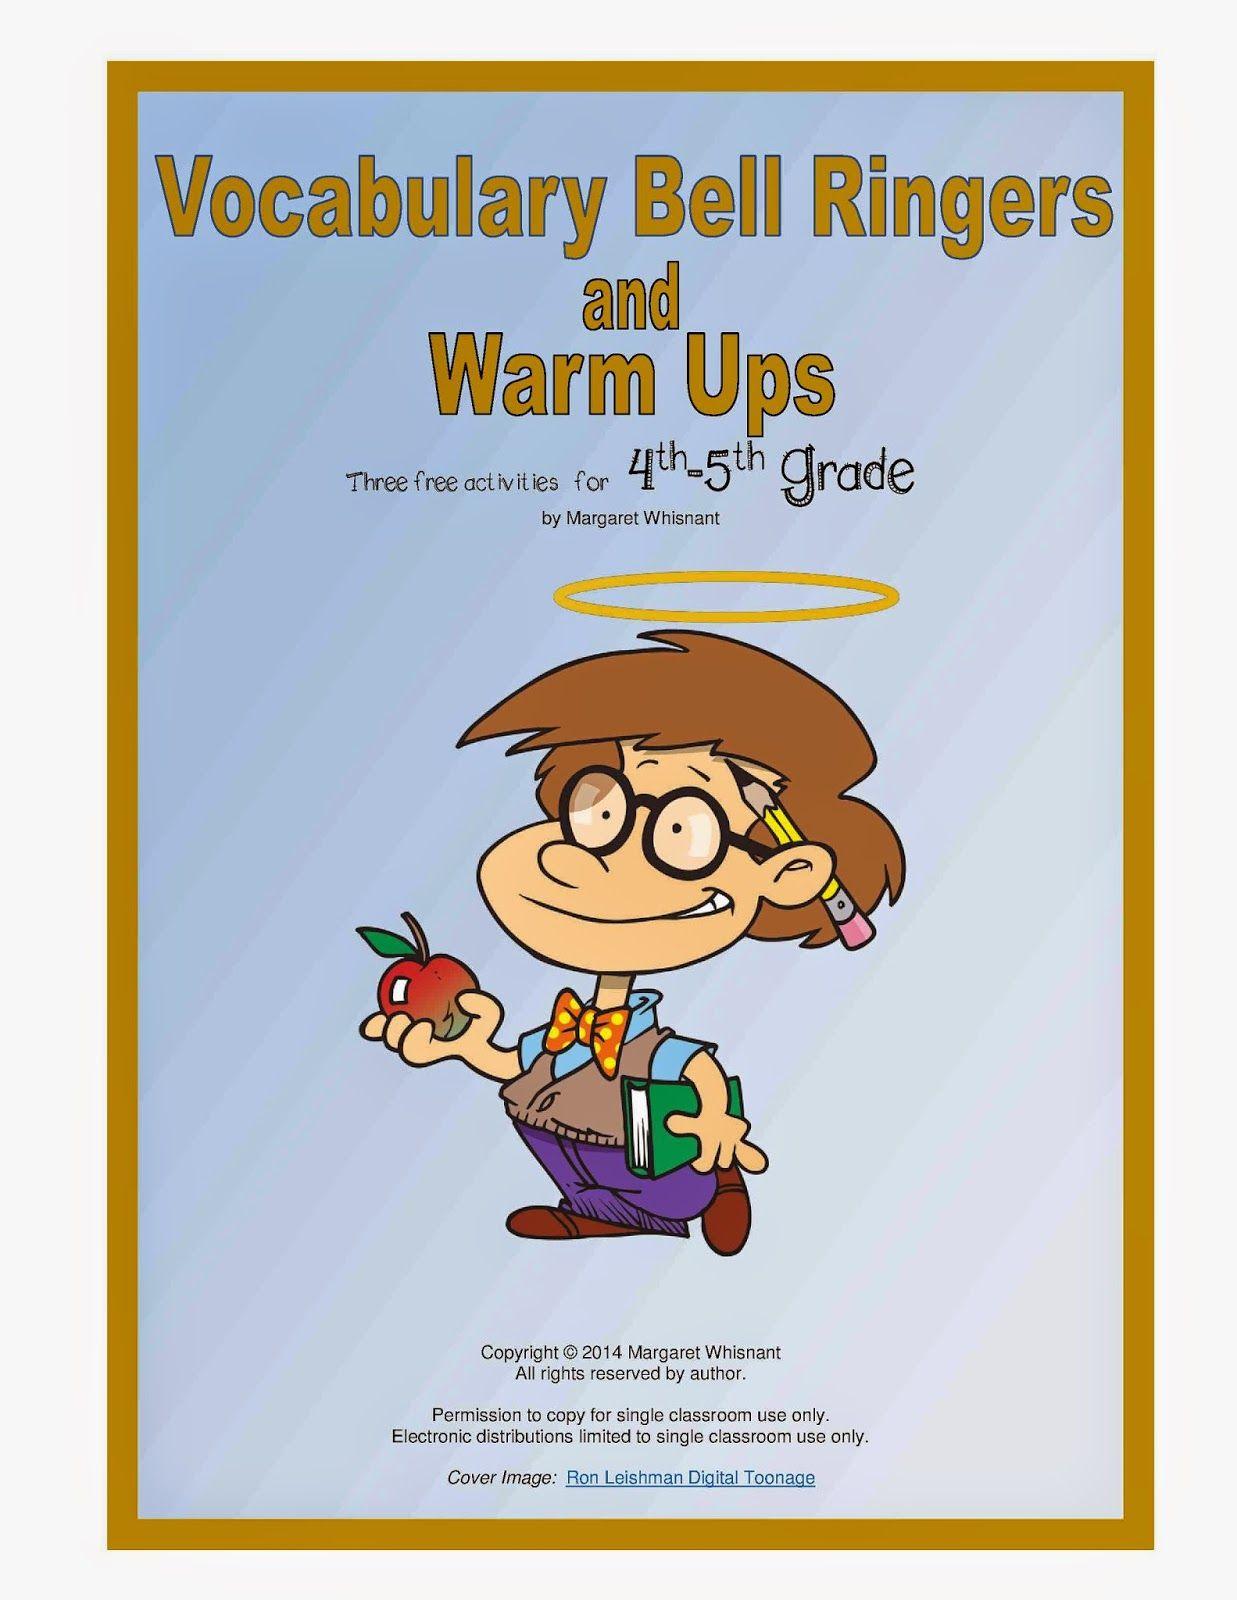 Free Downloads From Taking Grades For Teachers Margaret